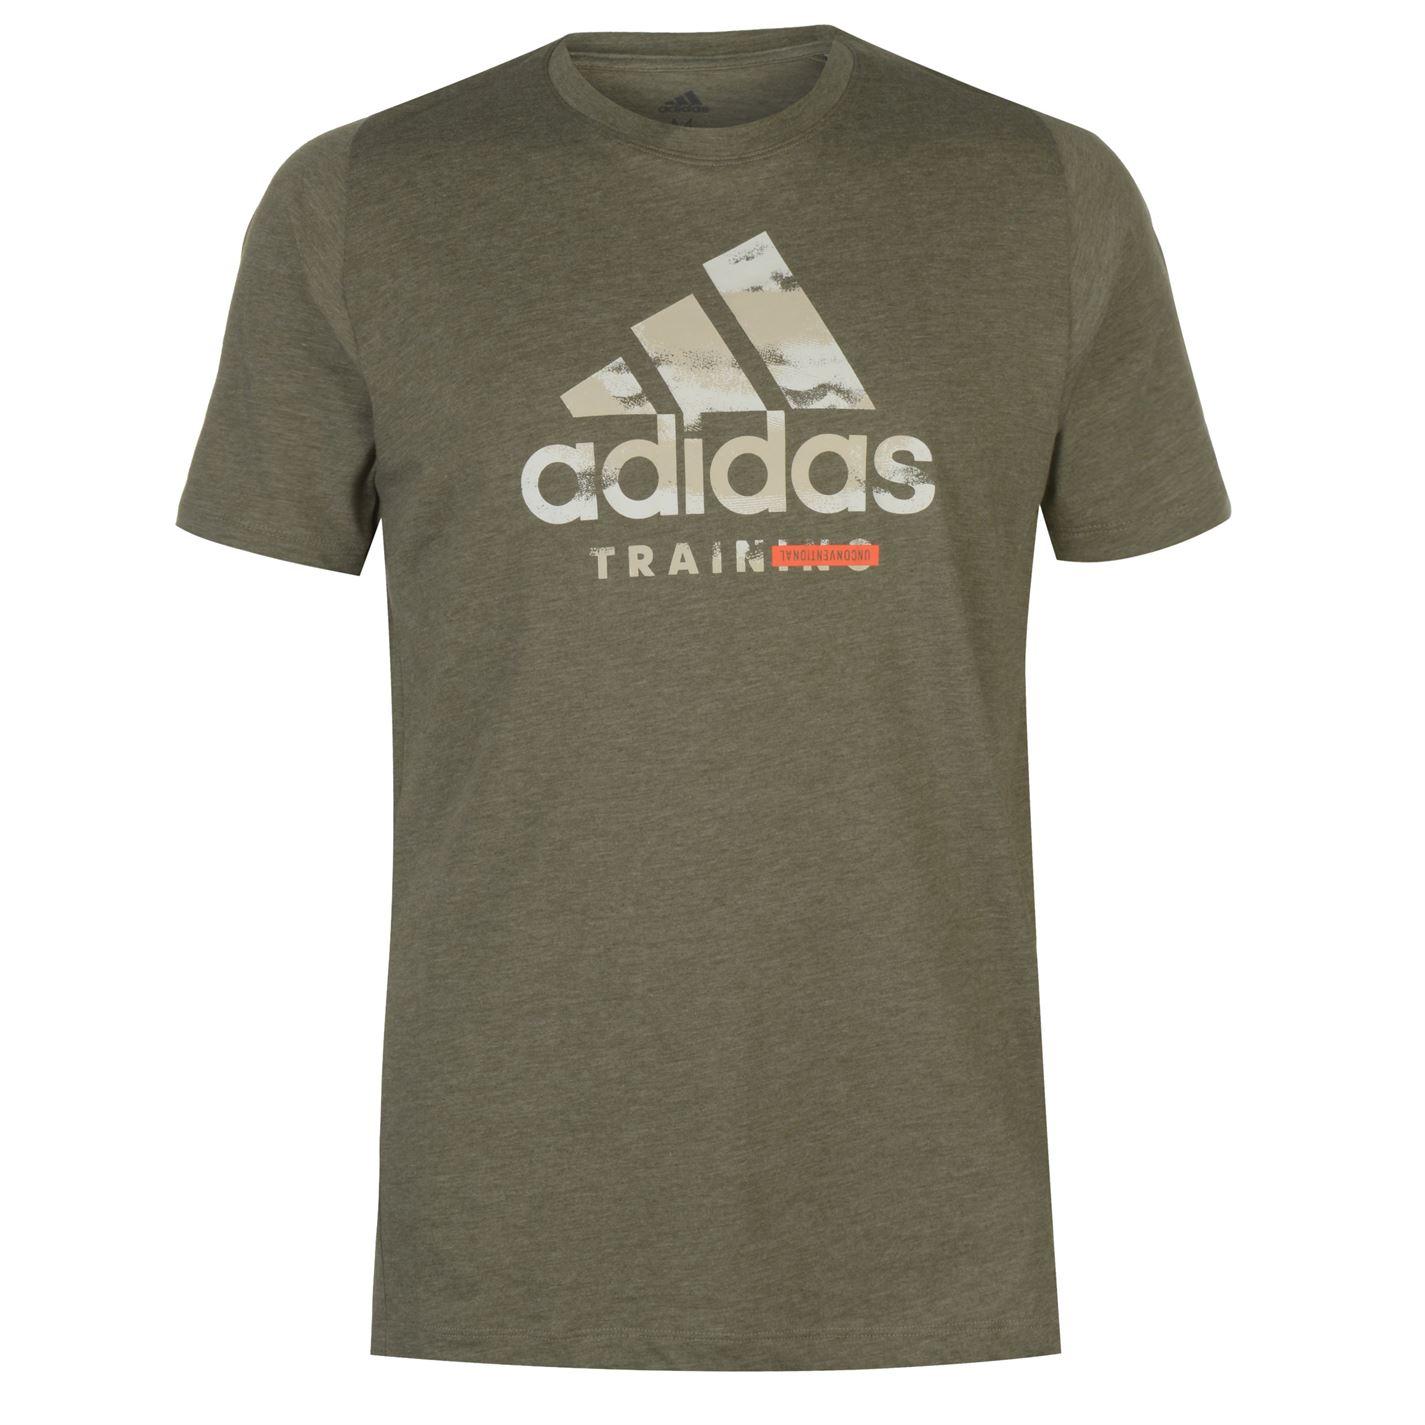 Adidas Mens Short Sleeve Performance Logo T-Shirt